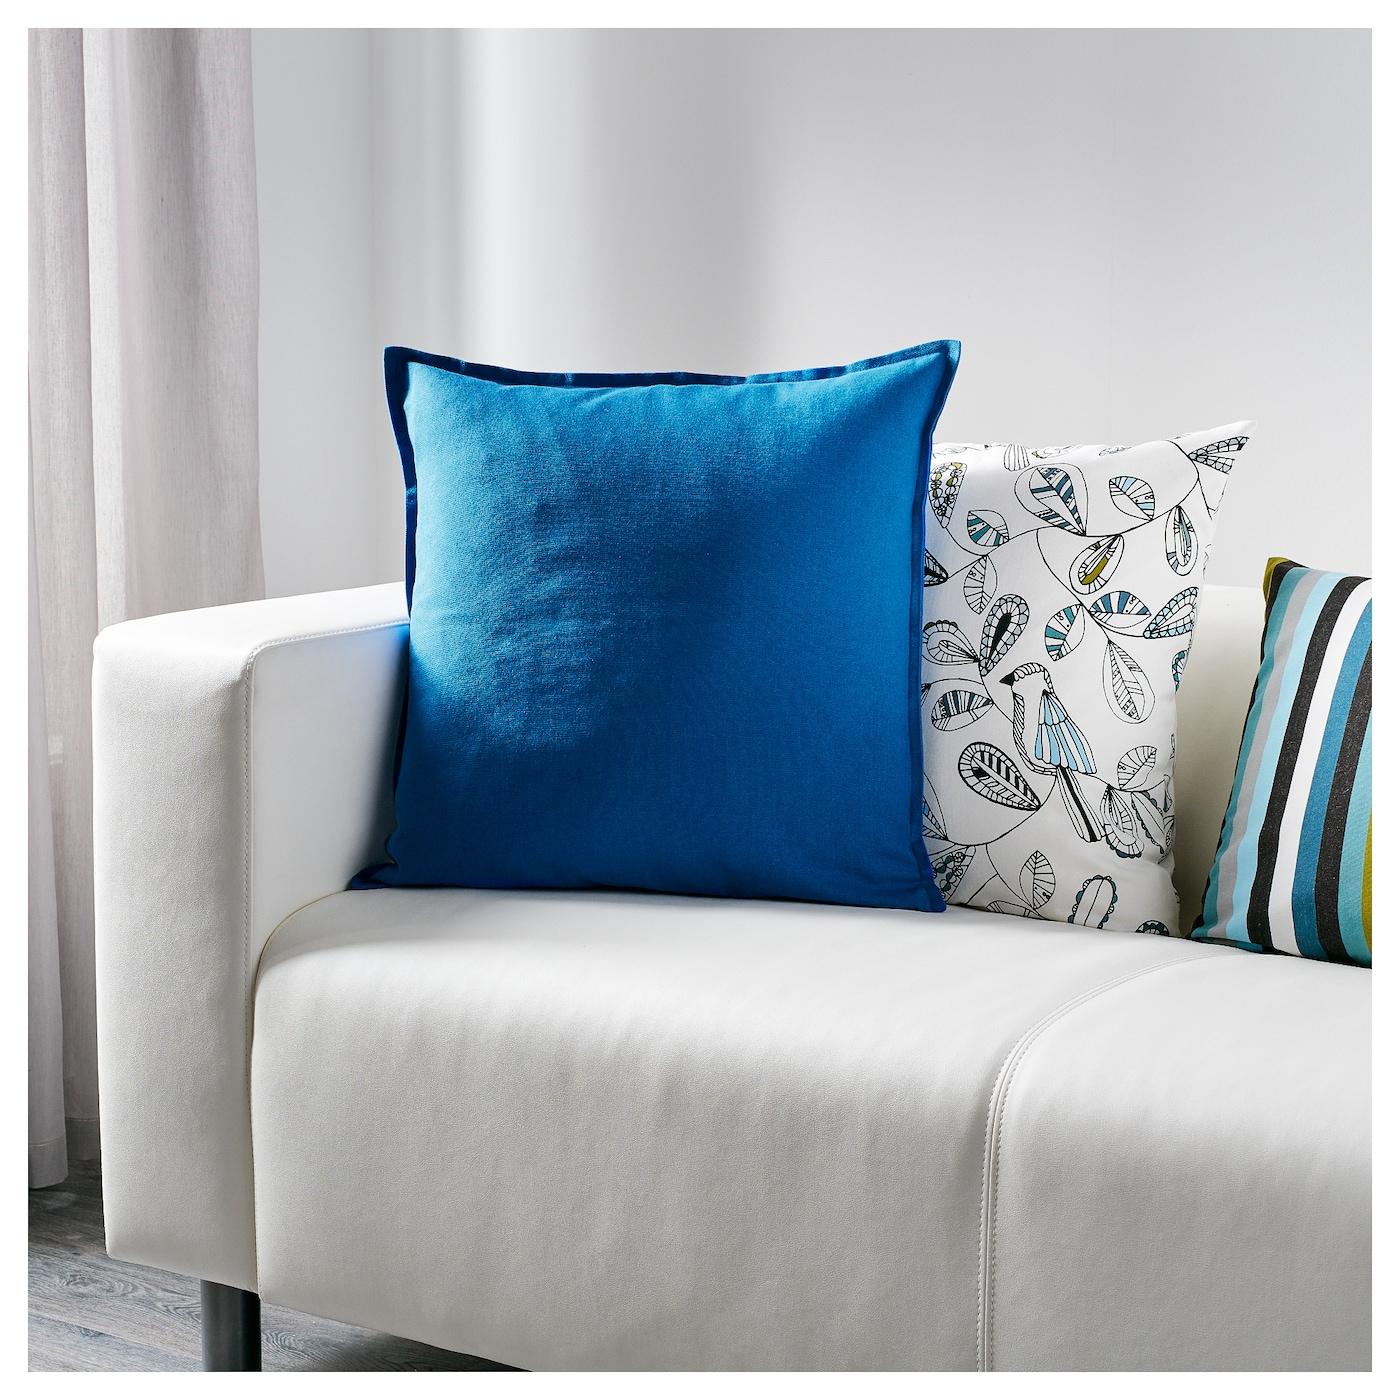 gurli housse de coussin bleu 50 x 50 cm ikea. Black Bedroom Furniture Sets. Home Design Ideas